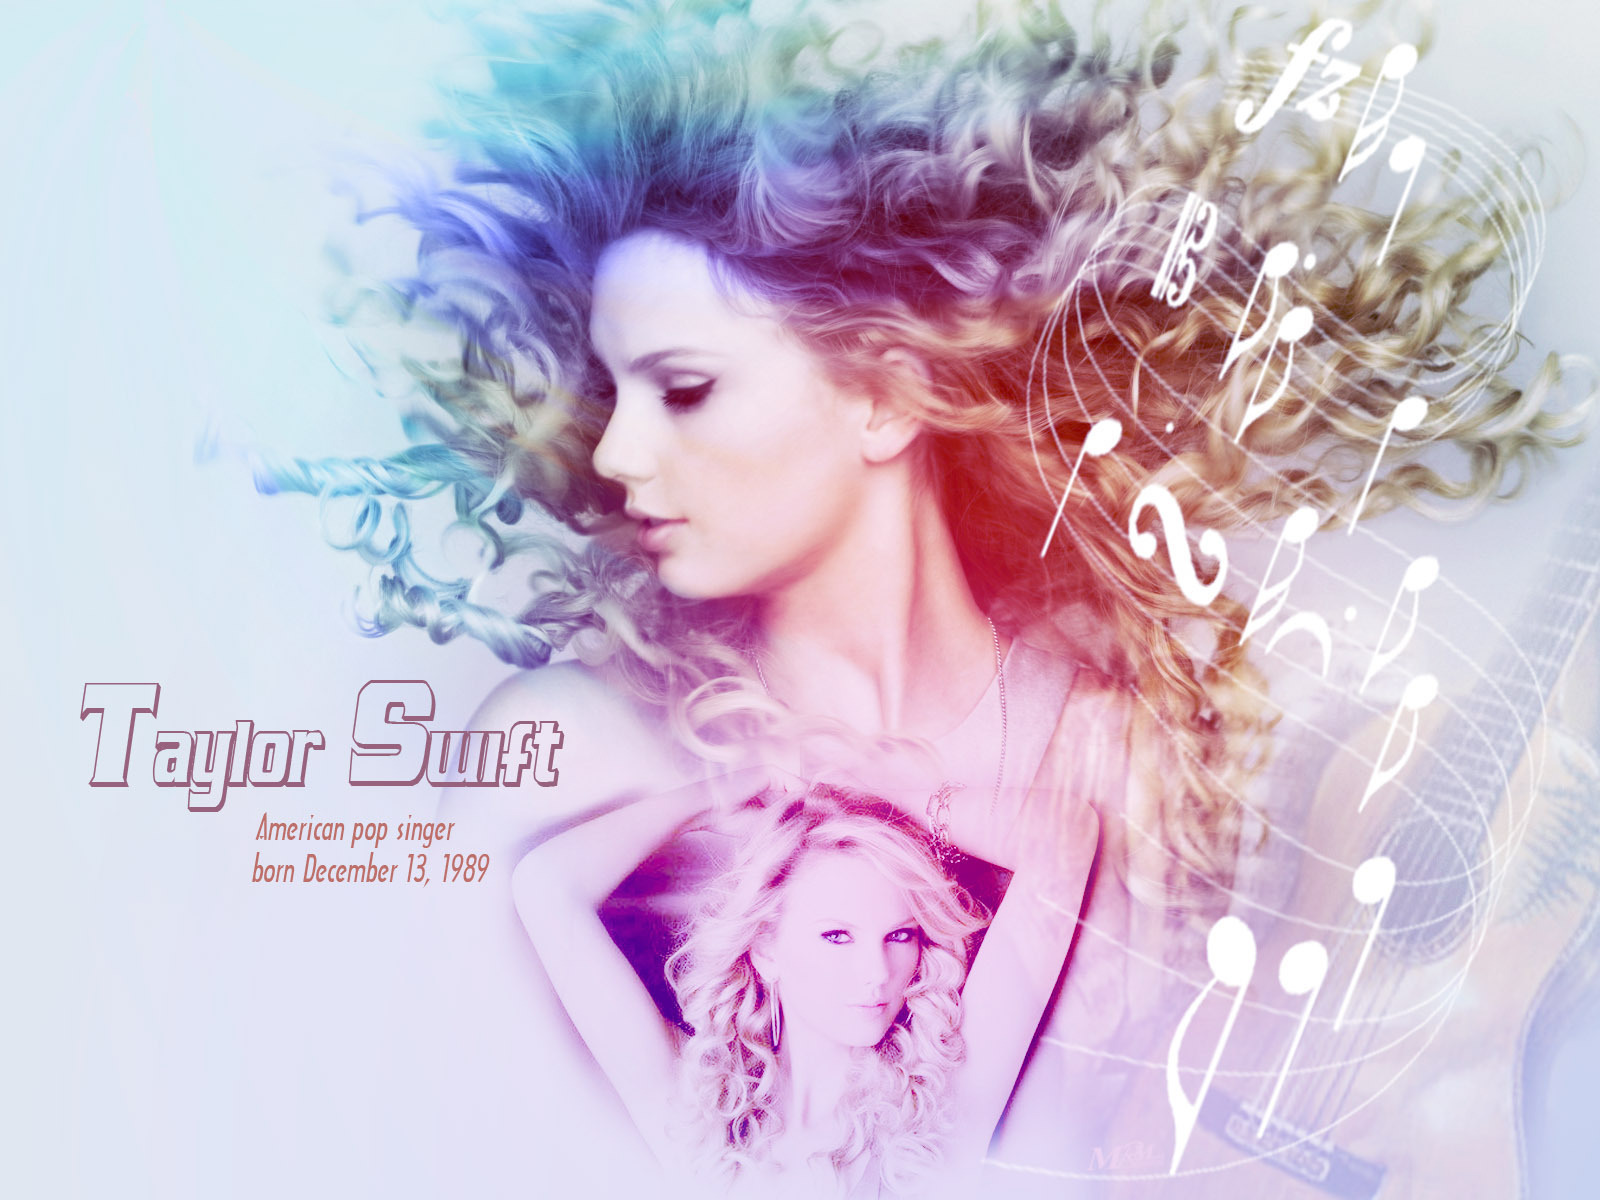 http://4.bp.blogspot.com/-c3hiFcW6UYU/TxQcuYZoyII/AAAAAAAABAw/s4T-CXRmIck/s1600/Taylor-Swift-Wallpapers-Widescreen-4.jpg